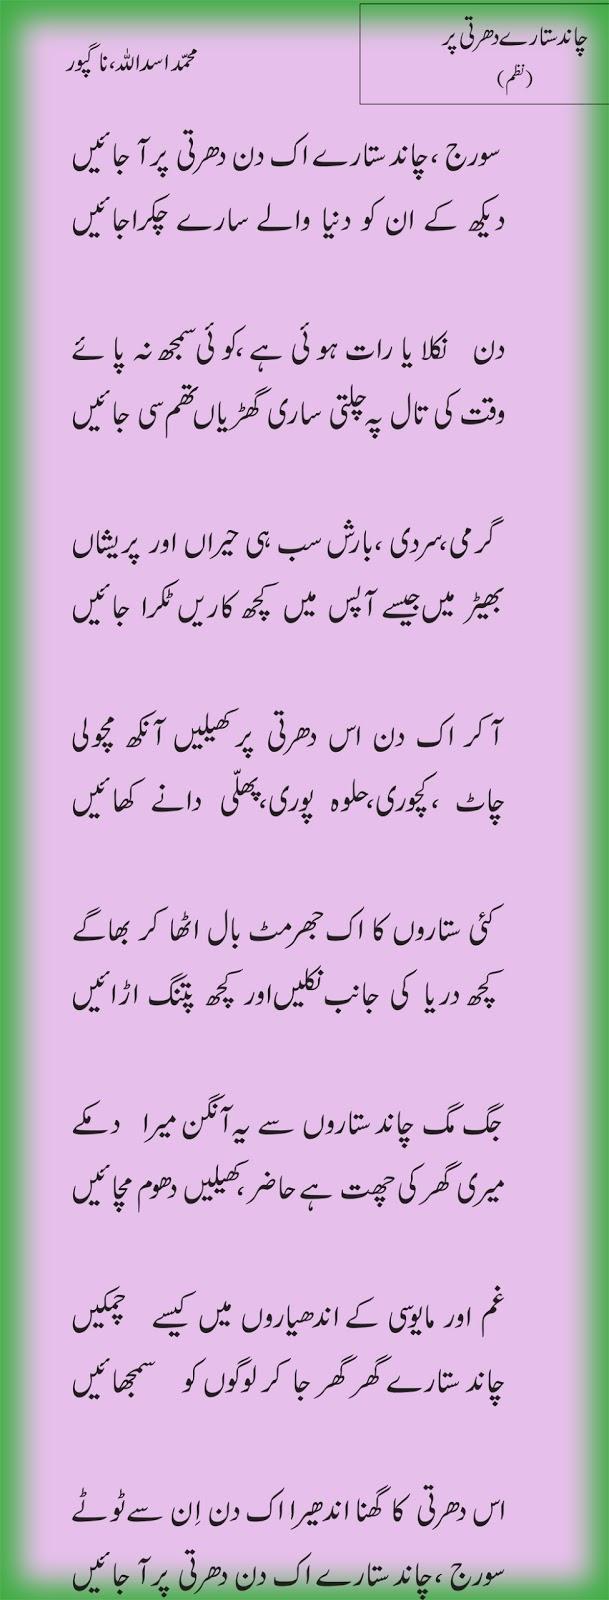 urdu essays for kids